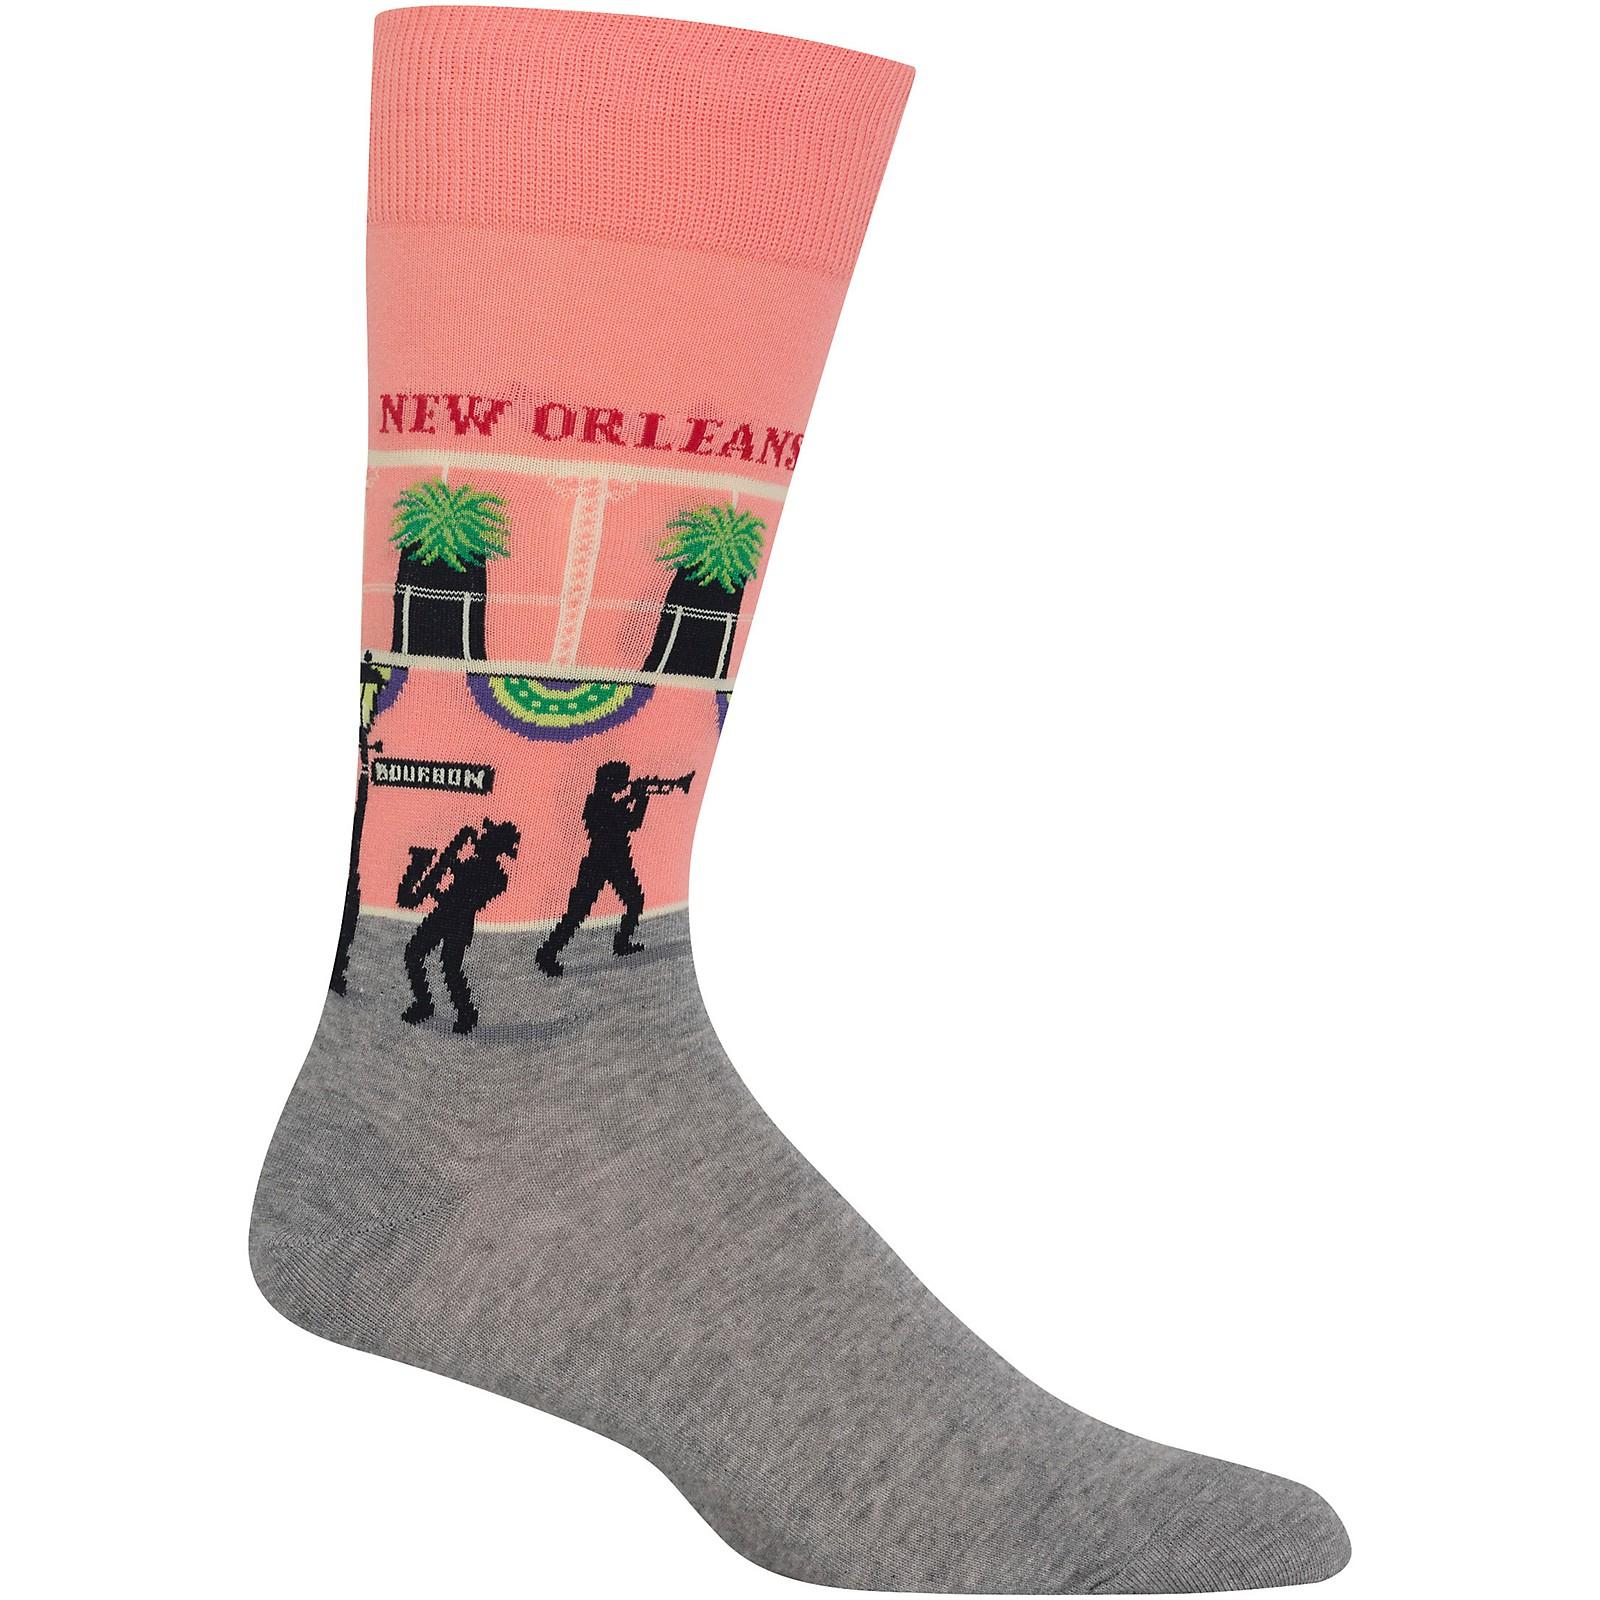 Hot Sox Men's New Orleans Socks